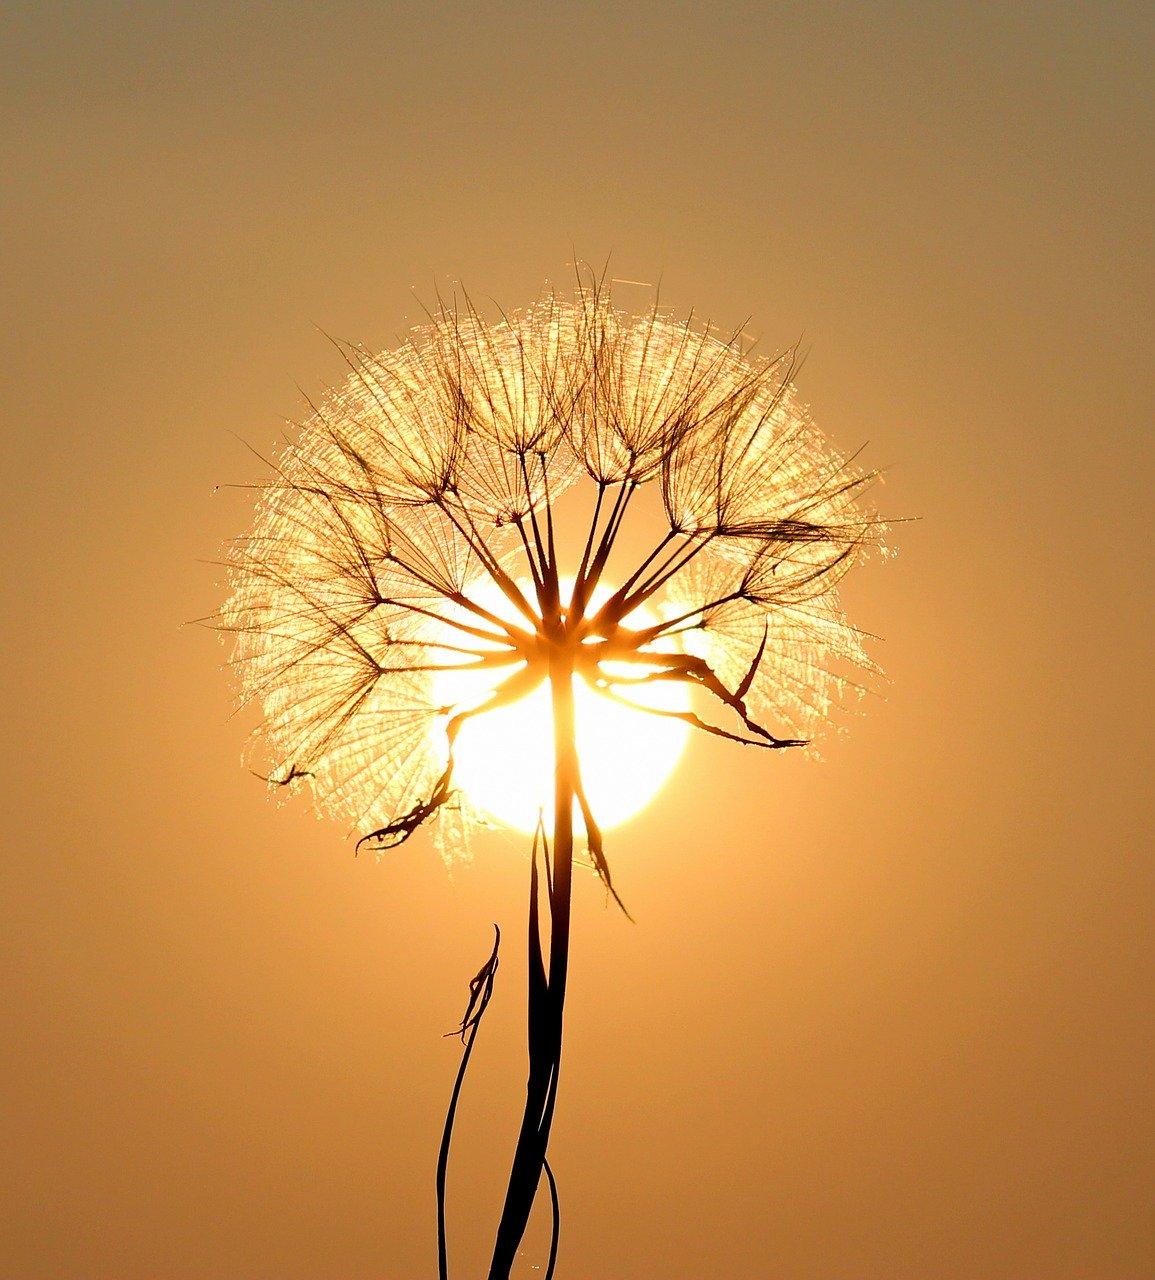 dandelion, sun, plants